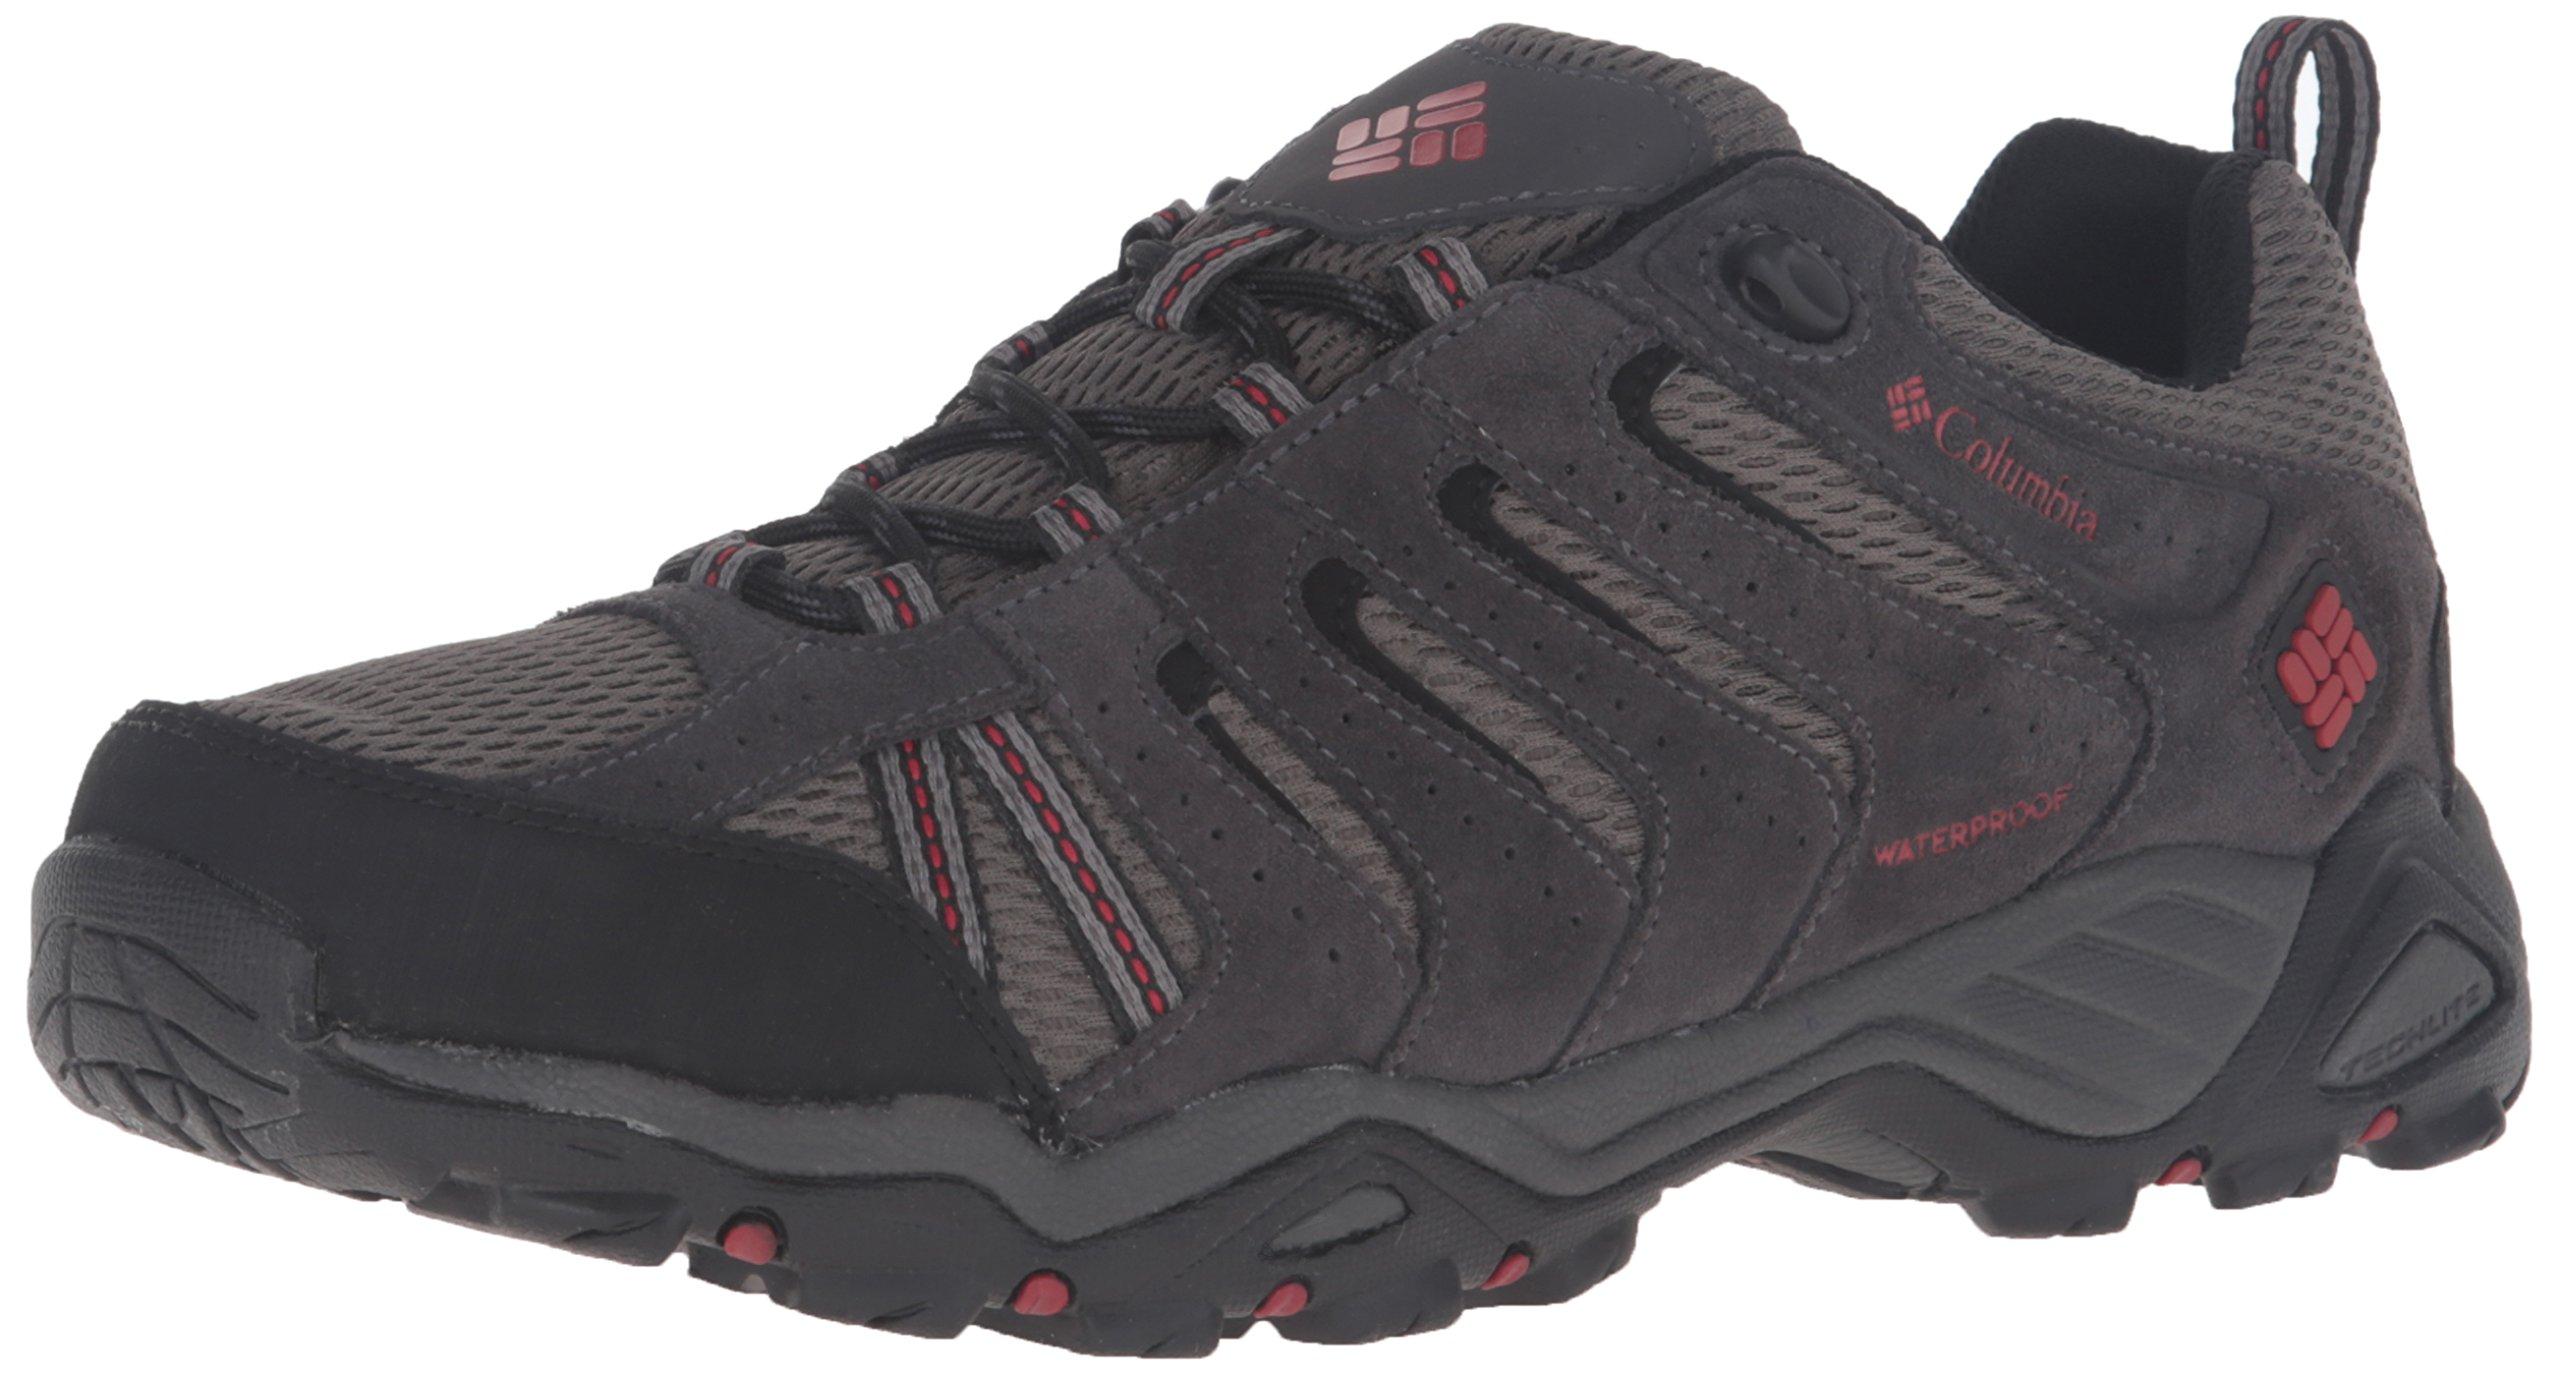 Columbia Men's North Plains II Waterproof Hiking Shoe, City Grey, Rocket, 10.5 D US